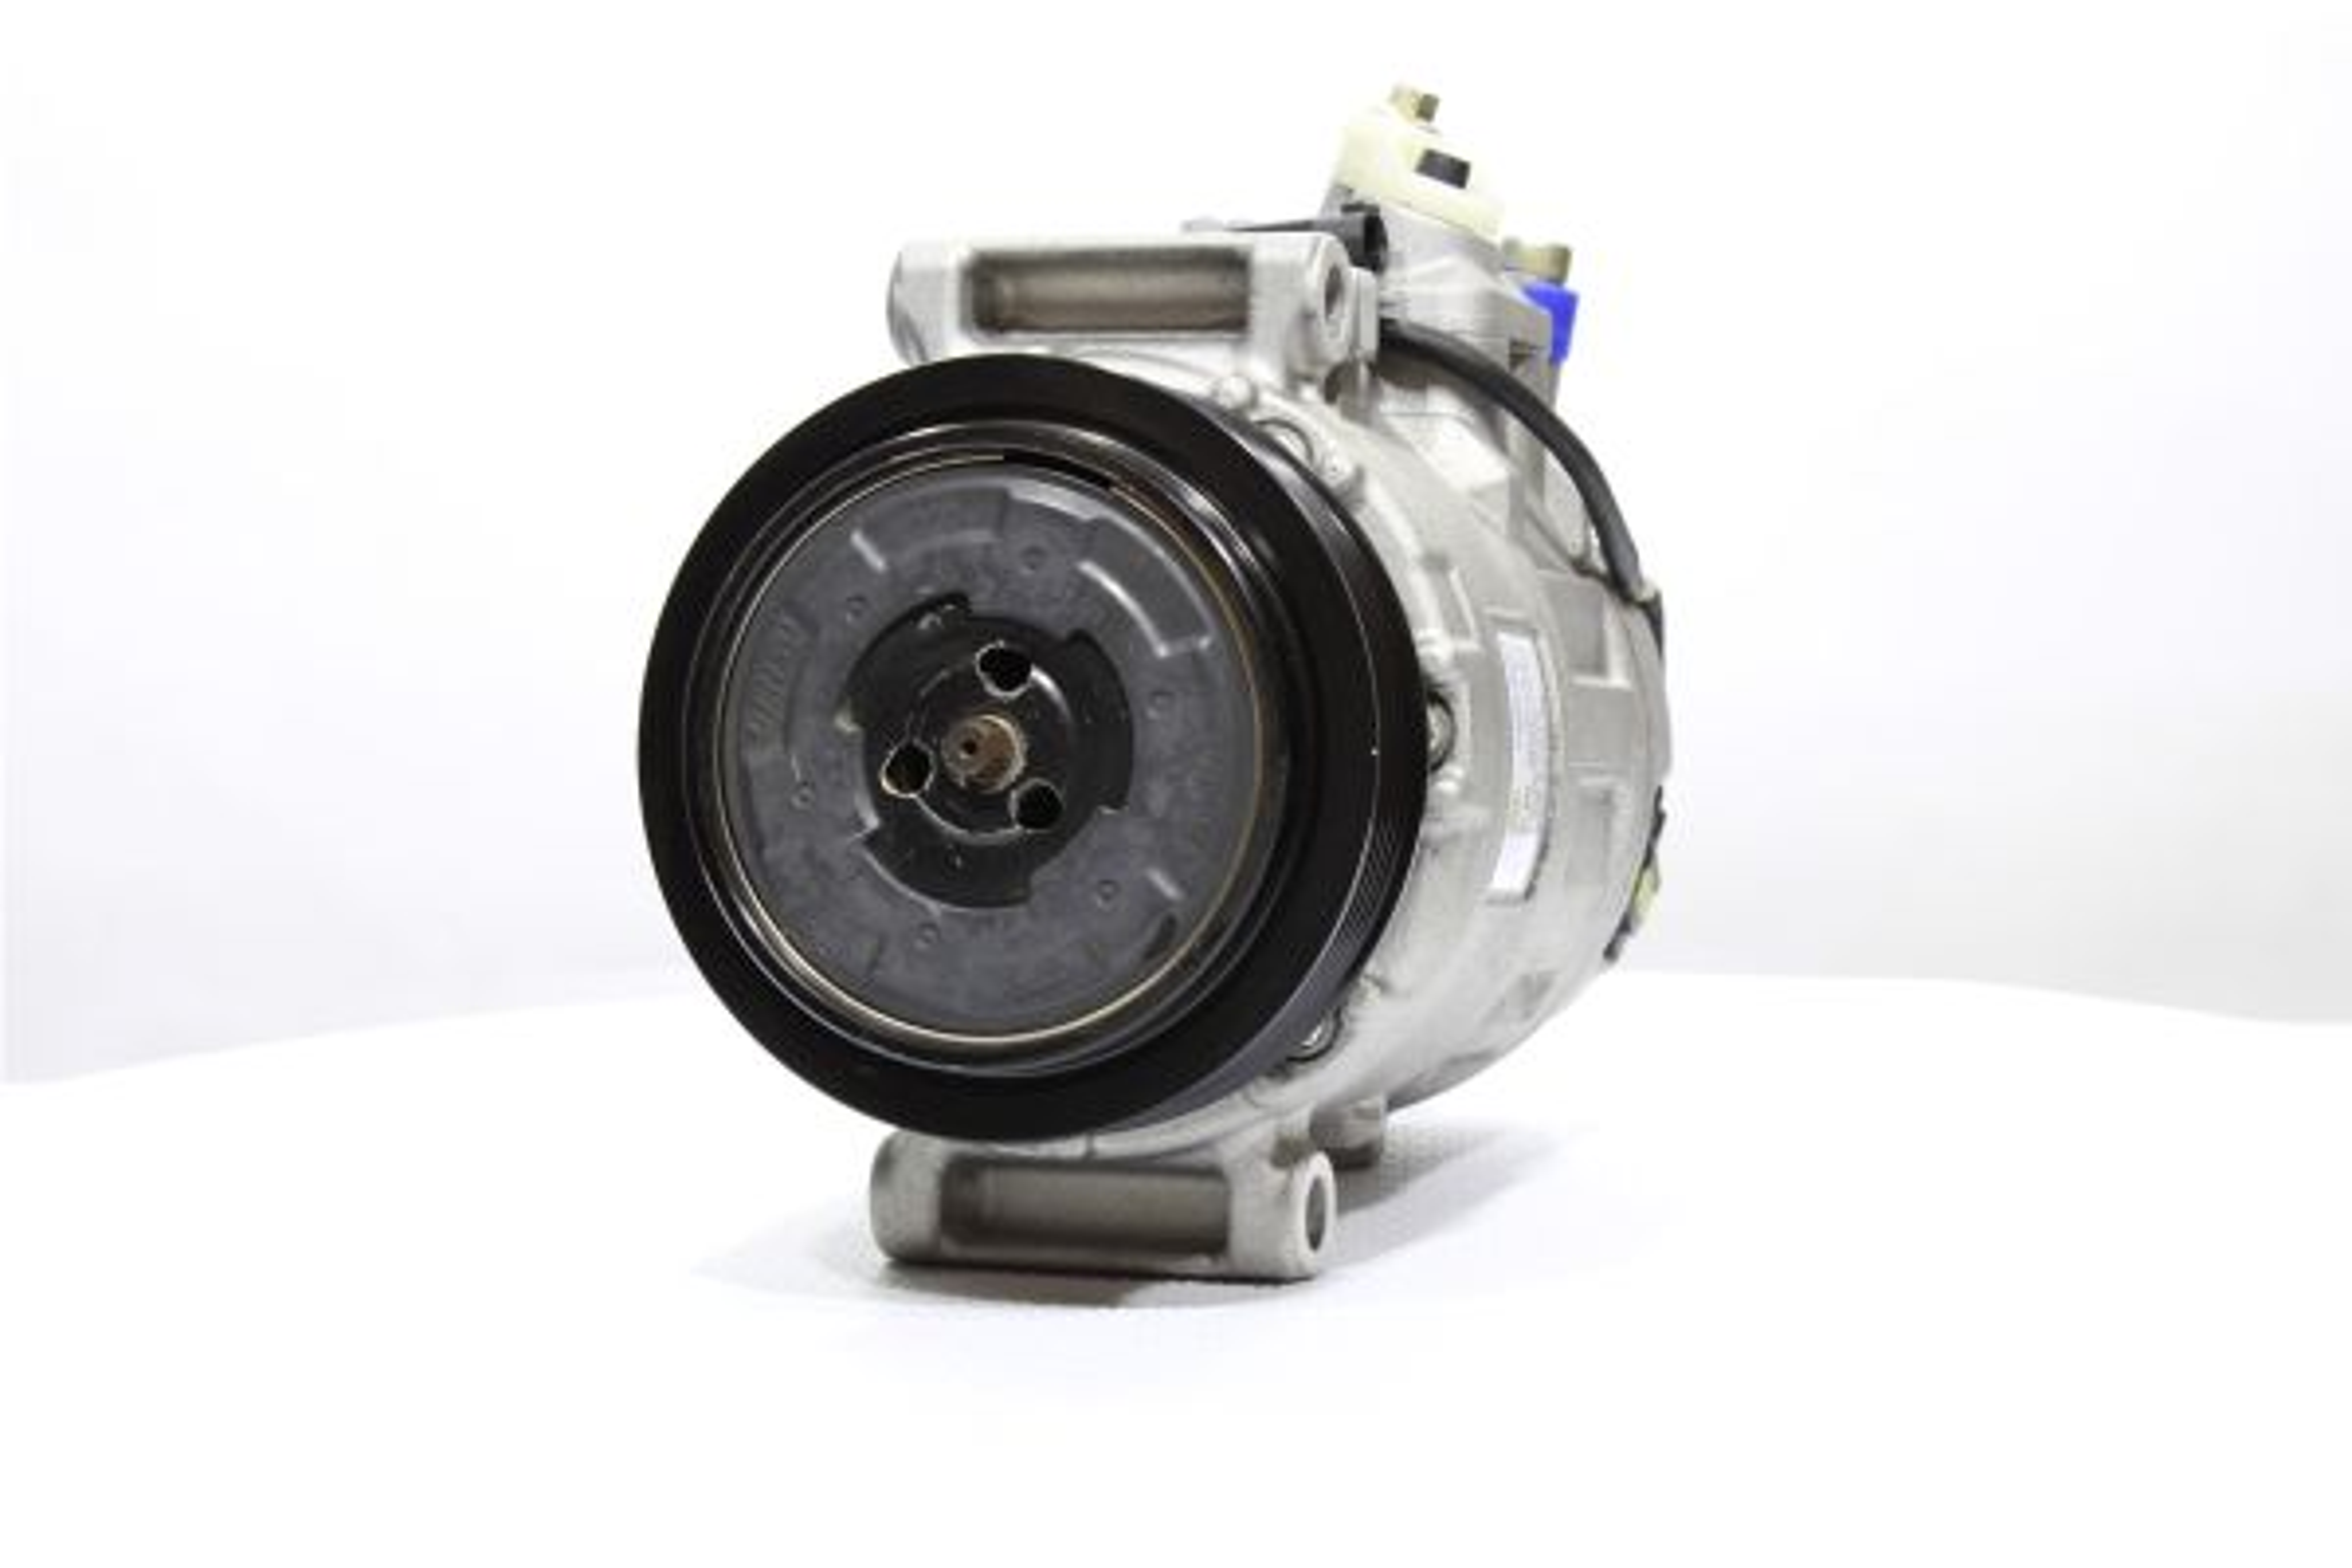 7SEU16C ALANKO PAG 46, Kältemittel: R 134a Riemenscheiben-Ø: 110mm Klimakompressor 10550536 günstig kaufen